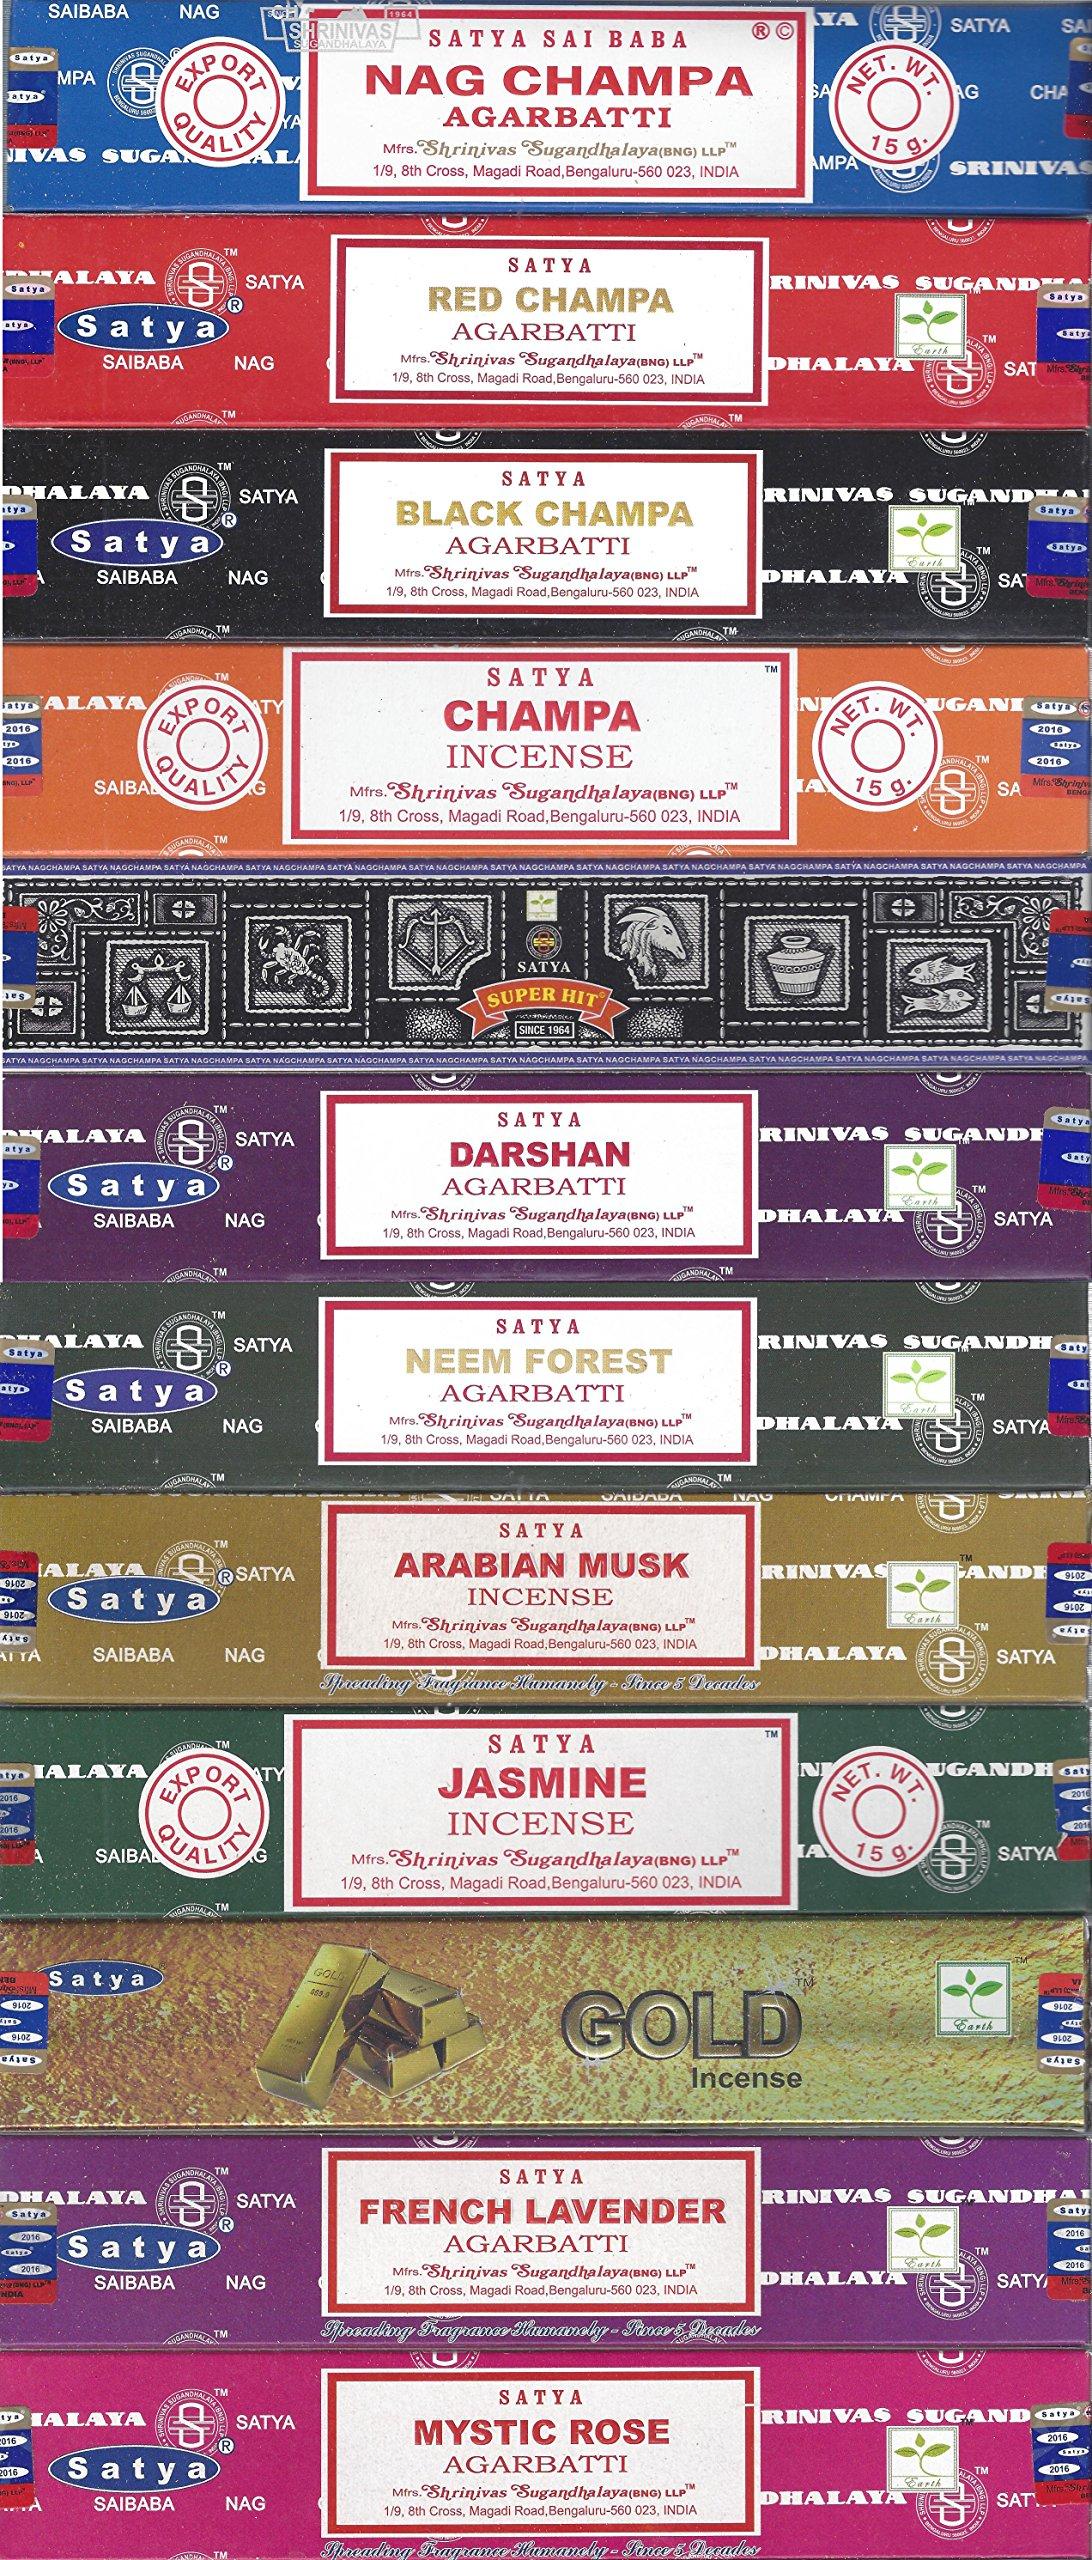 Satya Bangalore (BNG) Set of 12 Nag Champa, Red Champa, Black Champa, Champa, Super Hit, Darshan, Neem Forest, Arabian Musk, Jasmine, Gold, French Lavender, Mystic Rose Incense Sticks by Satya (Image #1)